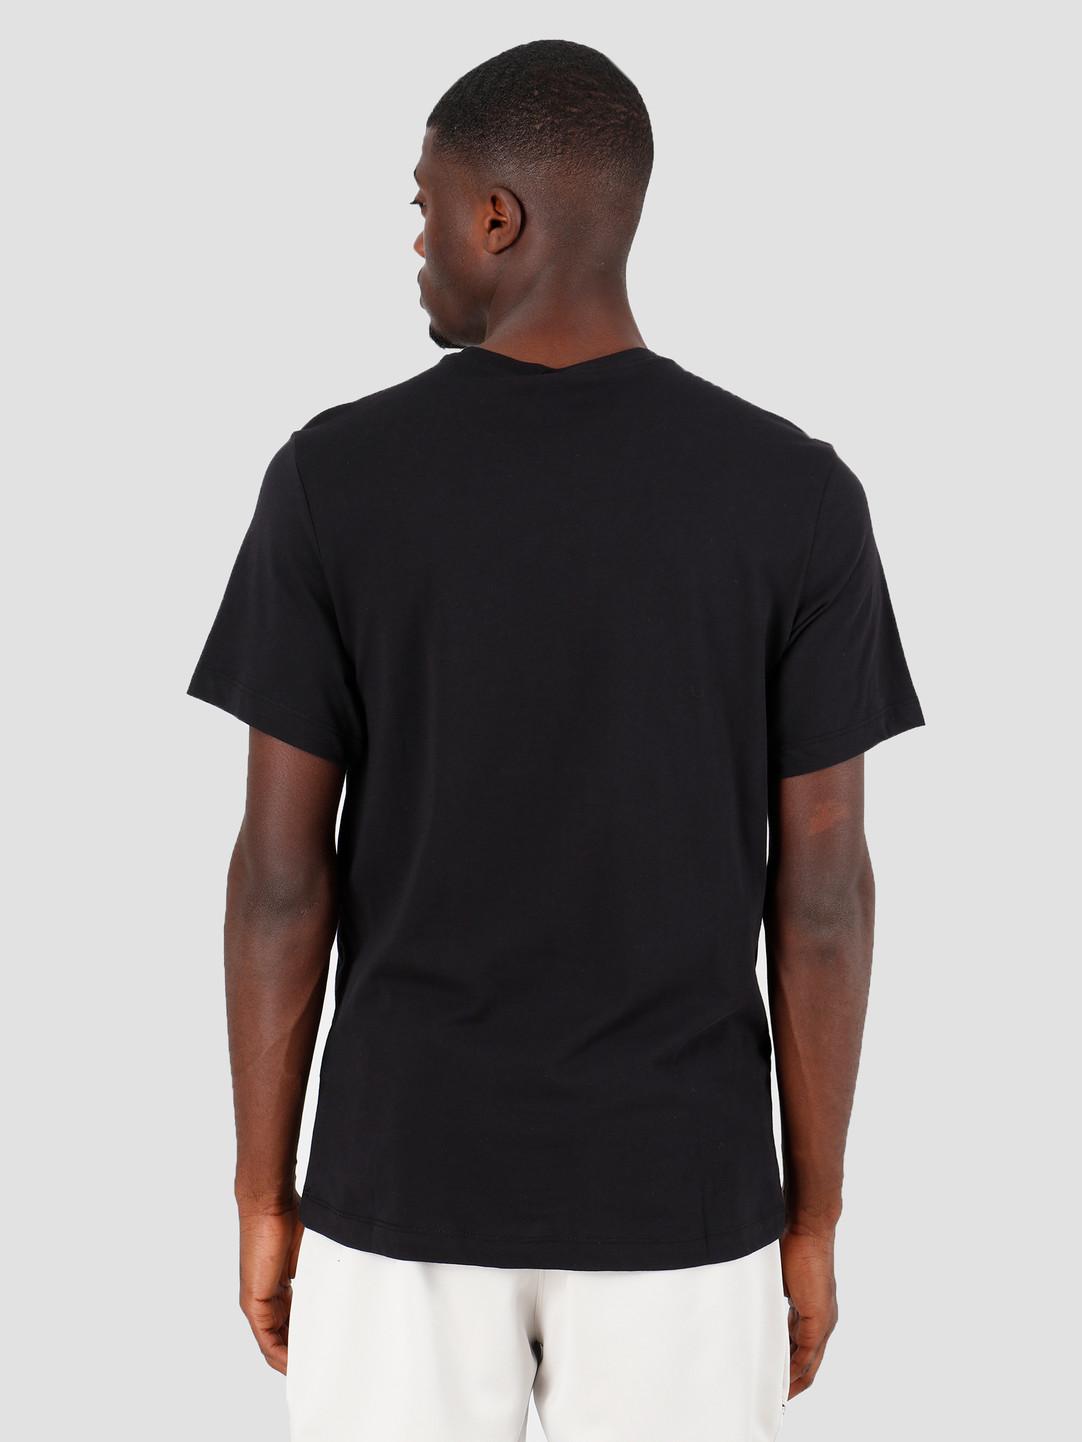 Nike NSW T Shirt Ftwr 1 Black White BV7551 010